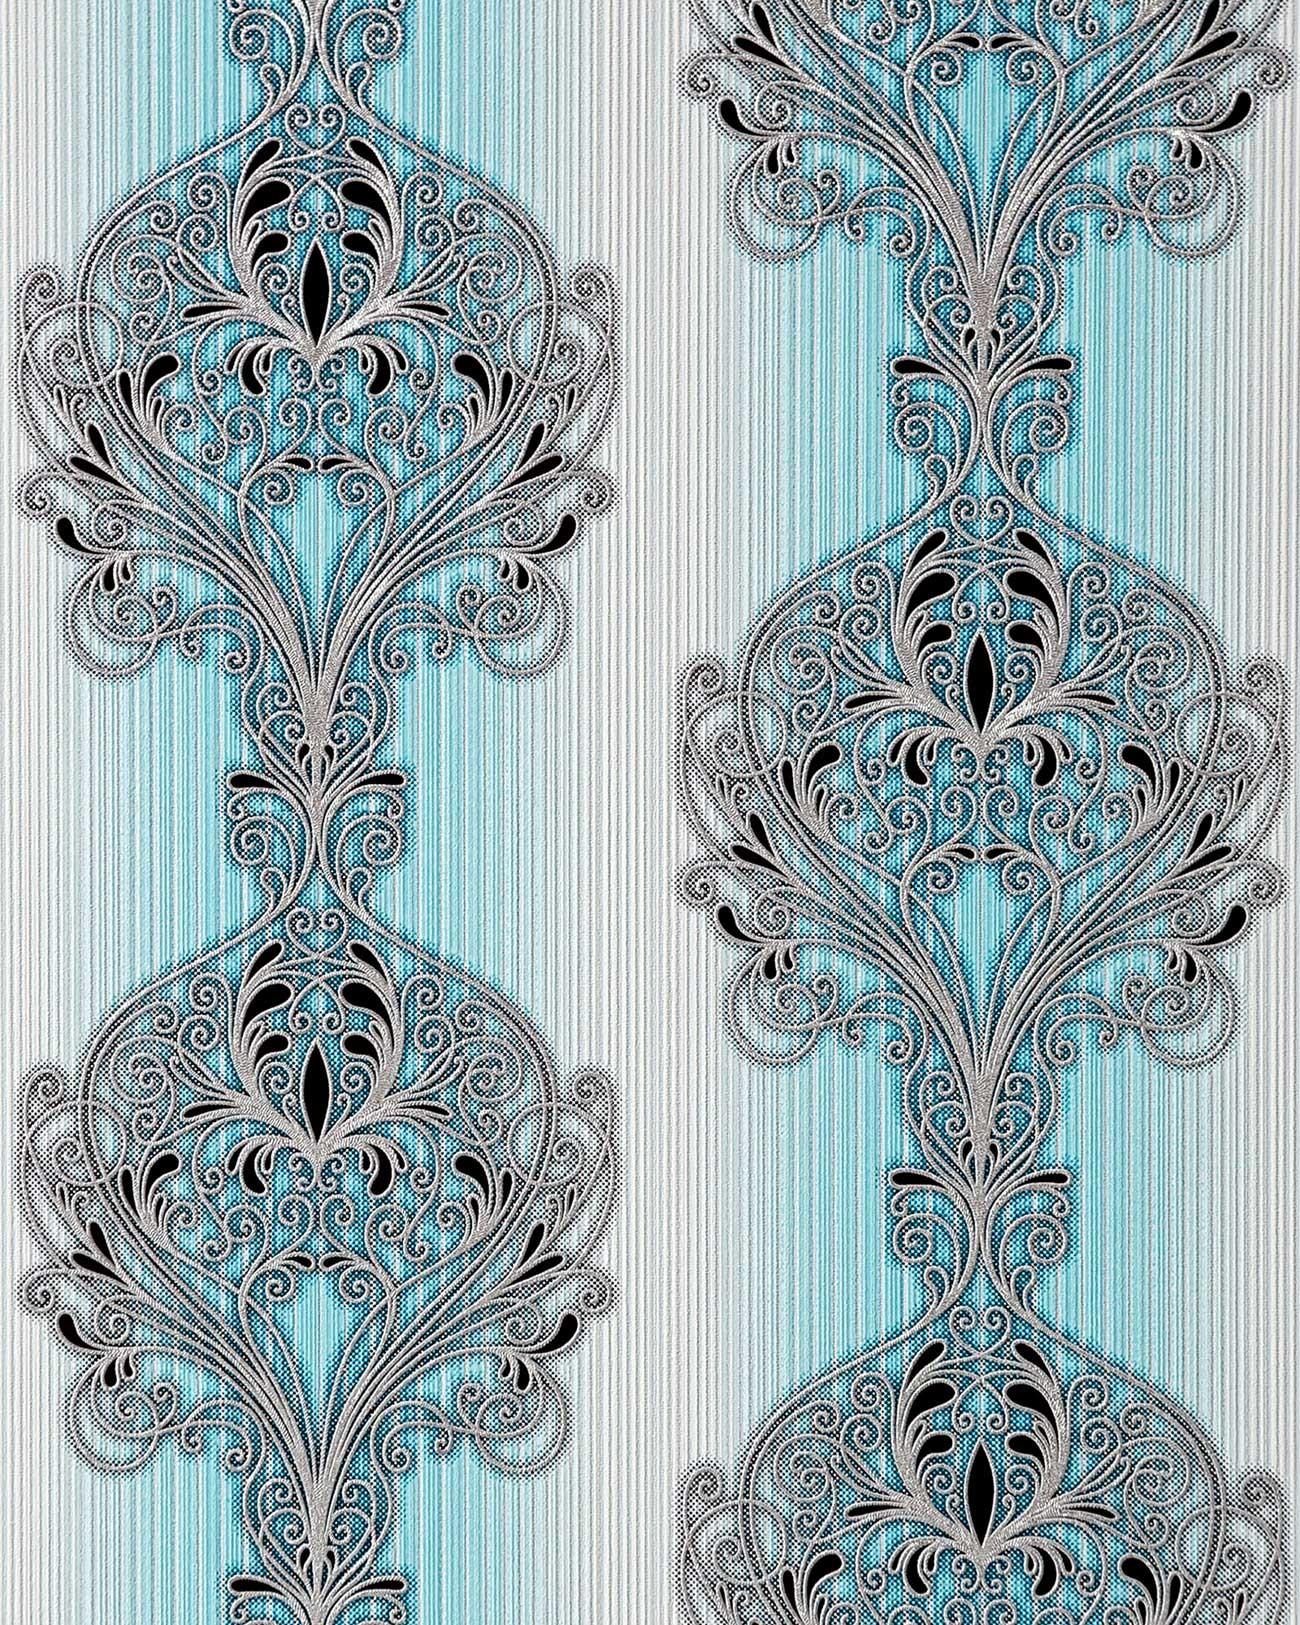 3d Barock Tapete Edem 096 22 Tapete Damask Prunkvolle Ornament